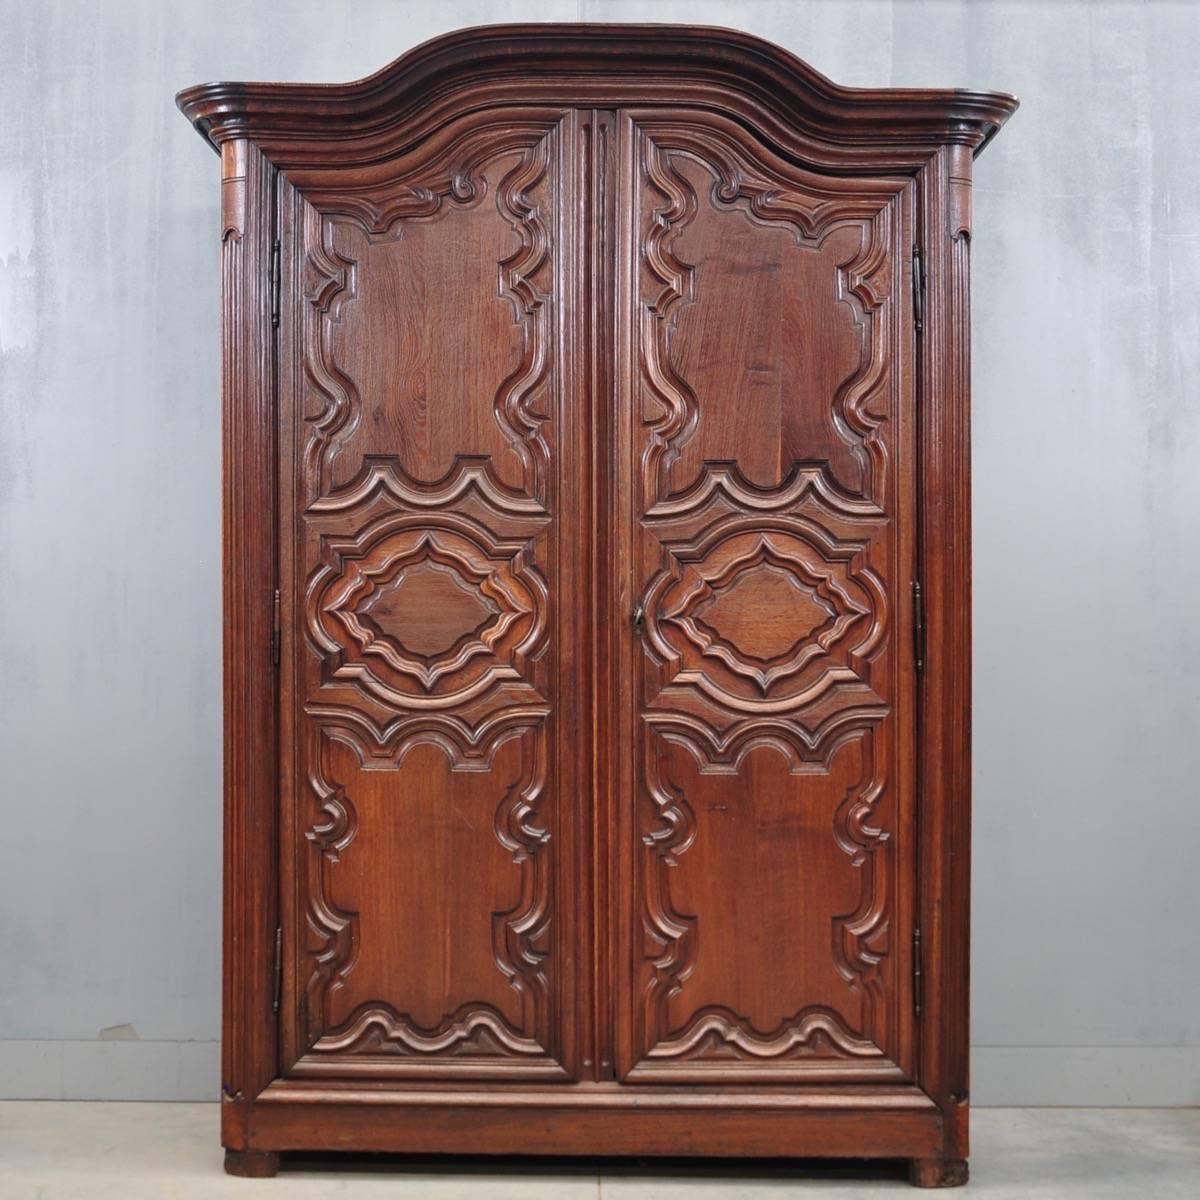 Antique French Armoire | De Grande French Antique Furniture